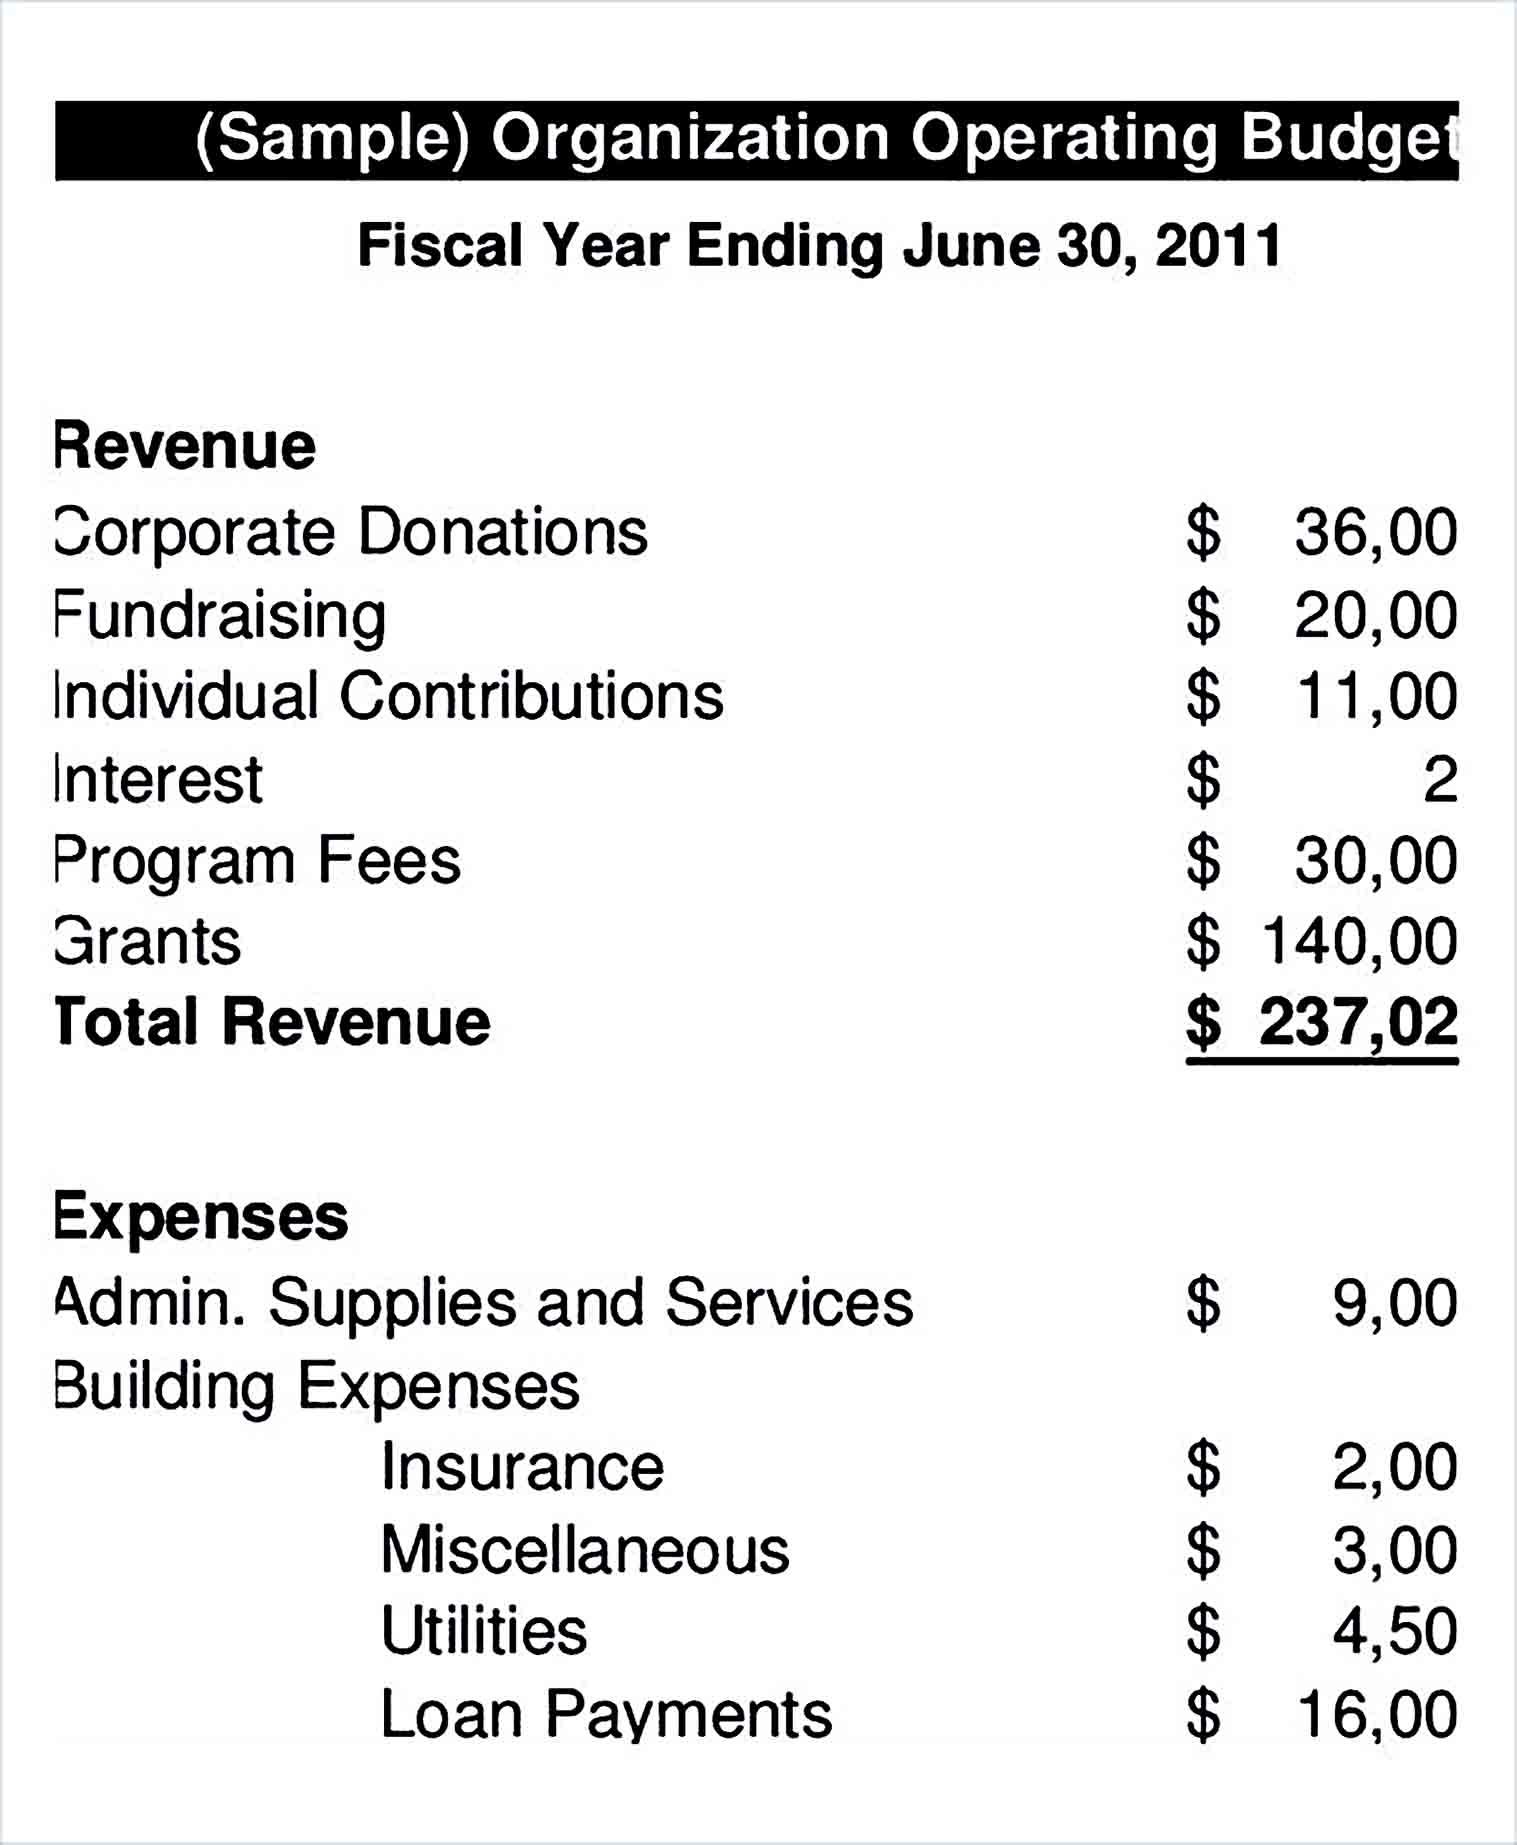 Organization Operating Budget Template